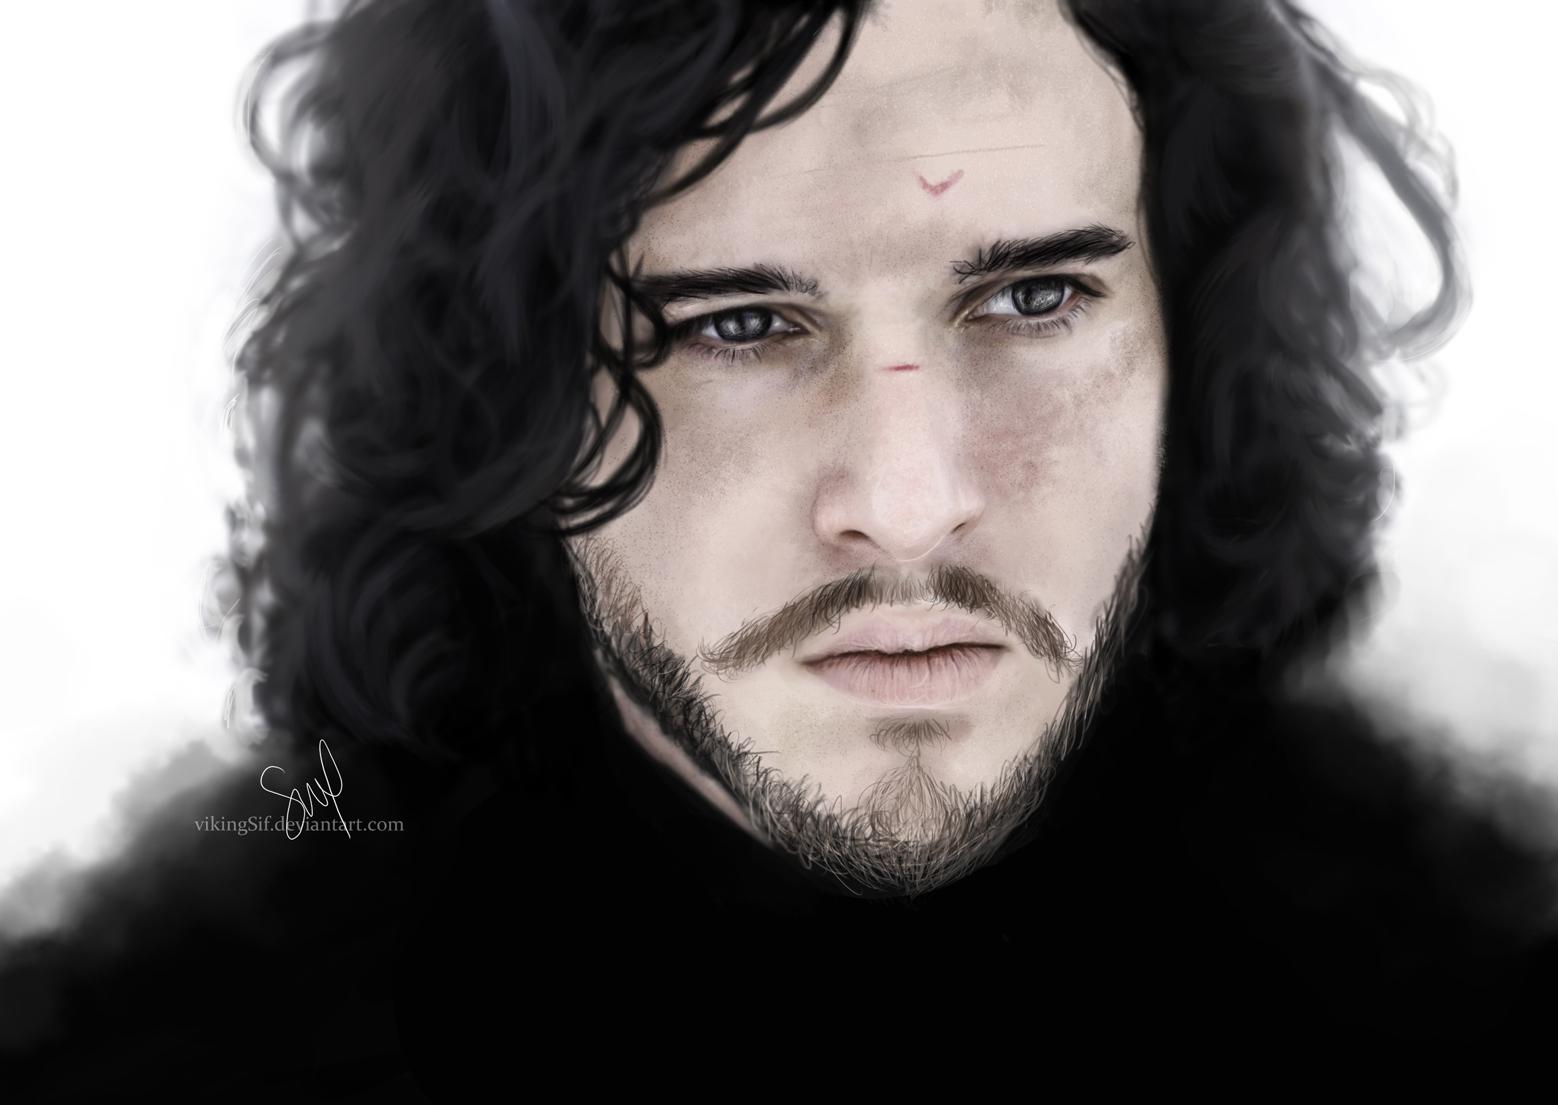 Jon Snow by VikingSif